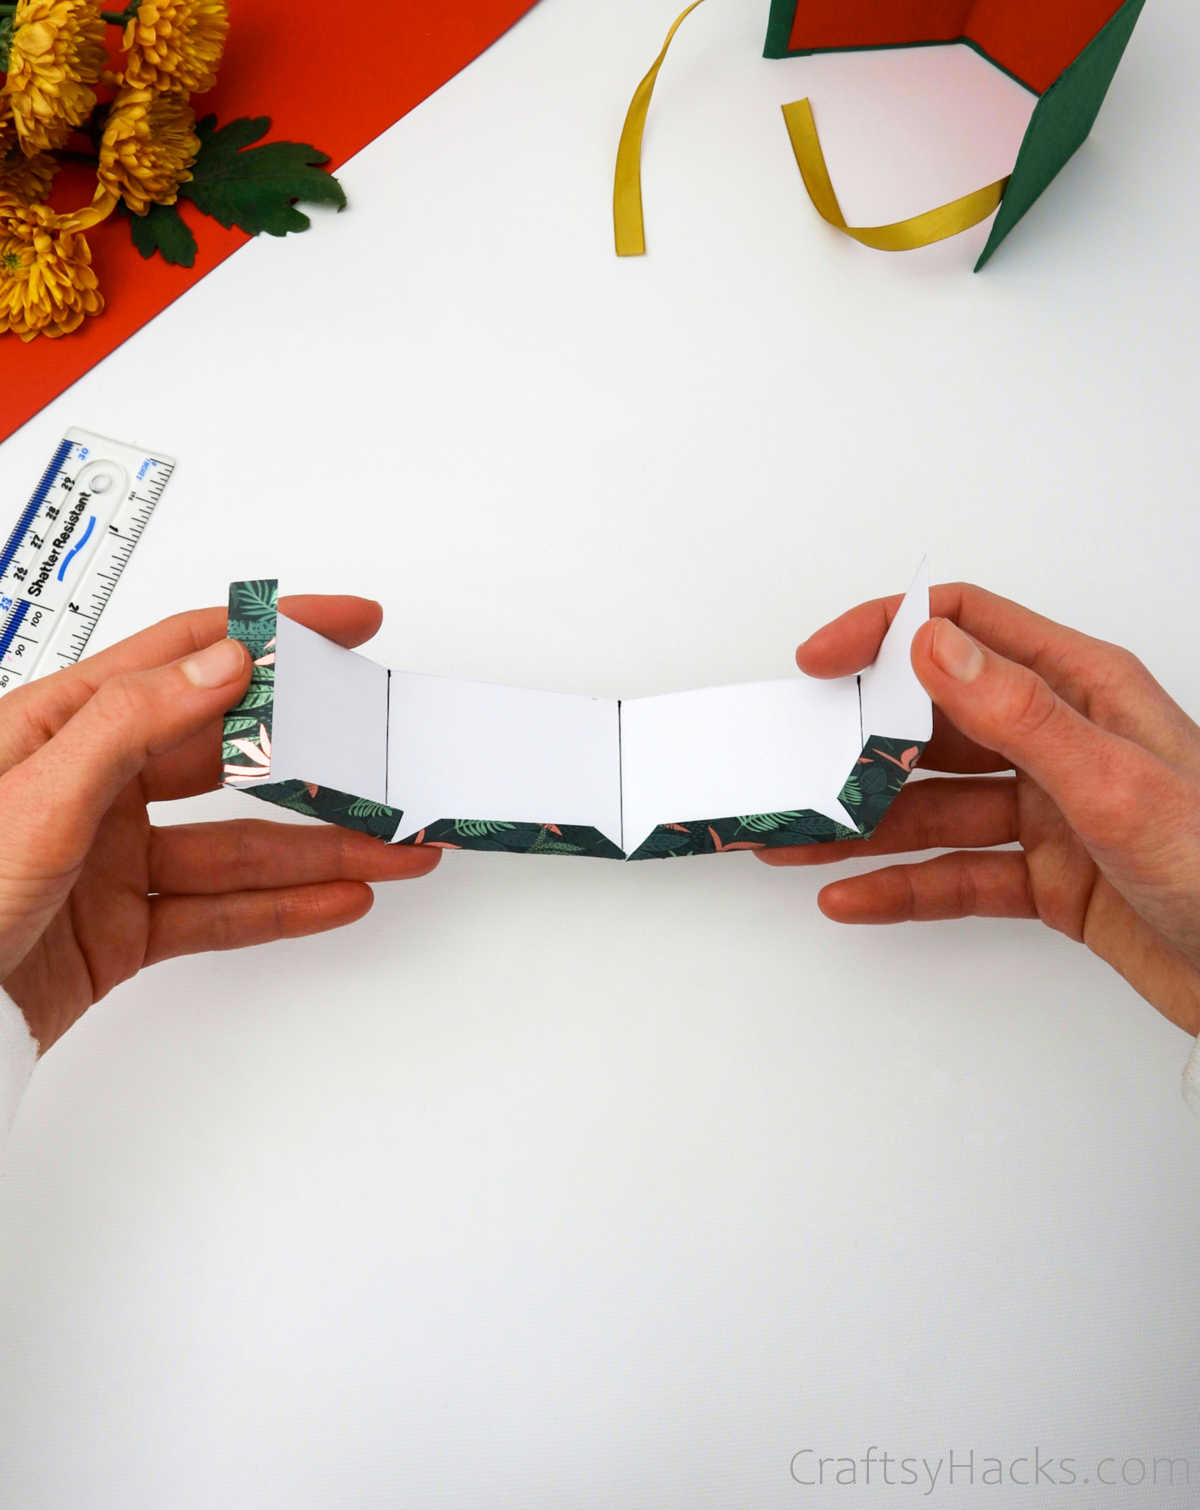 folding gift box together